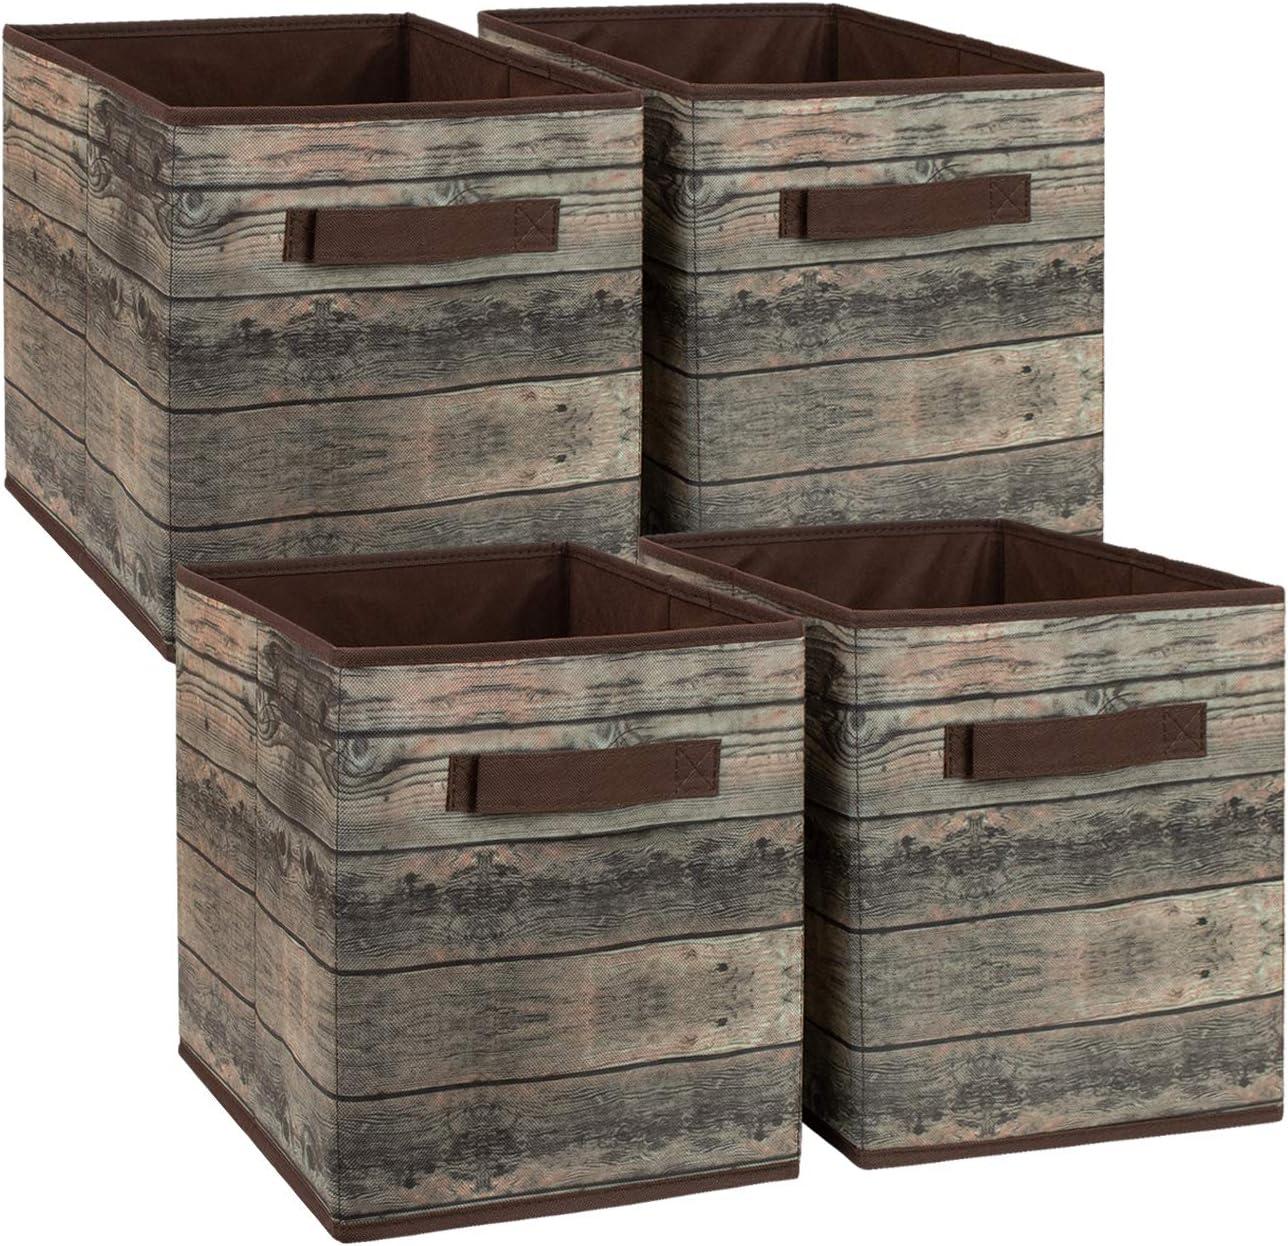 Sorbus Foldable Storage Cube Basket Bin, Rustic Wood Grain Print, 4-Pack (Rustic Bin - Brown)